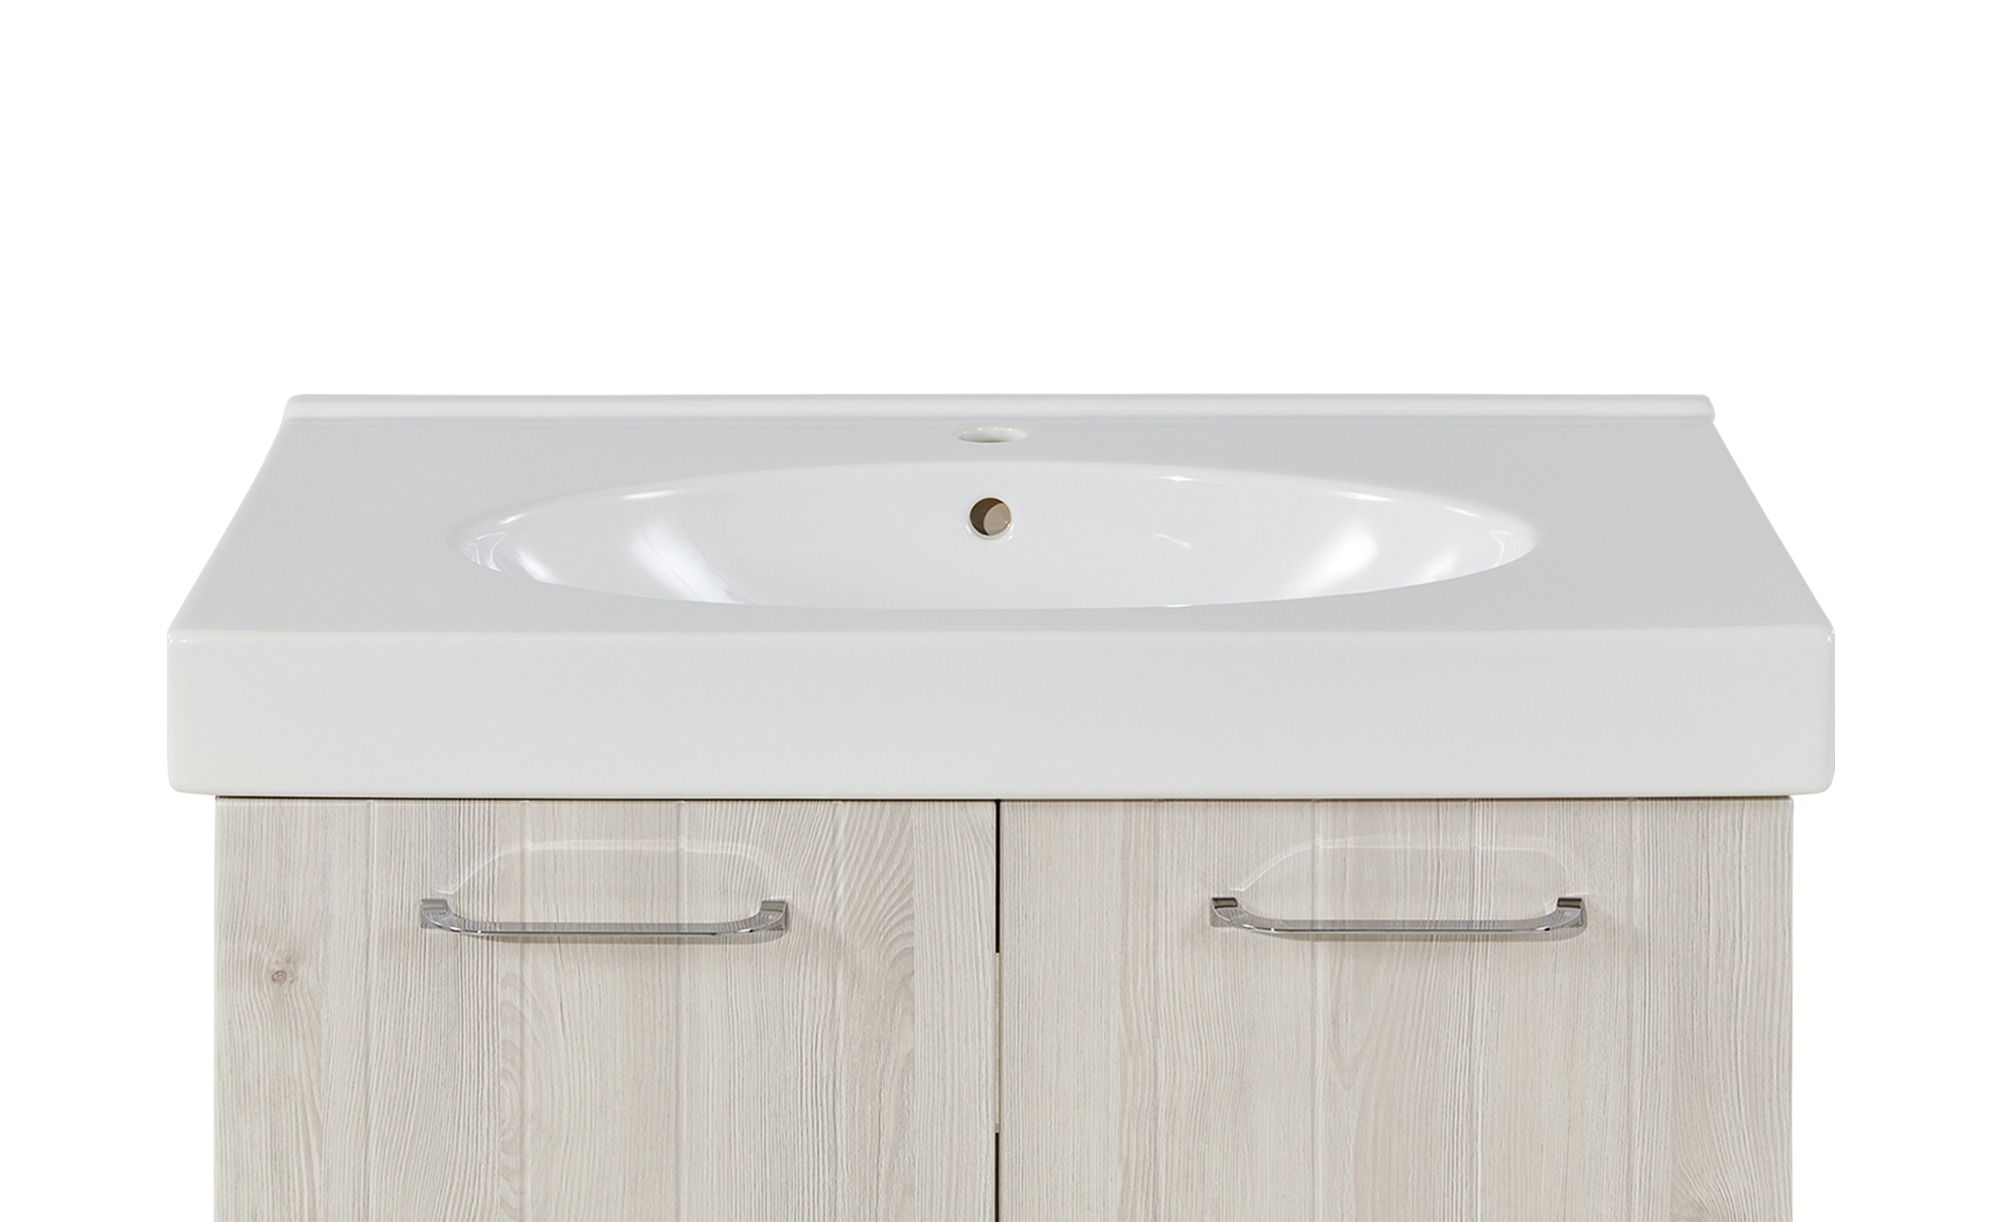 Calmo2go Waschtisch Maarsee In 2020 Waschtisch Badmobel Set Weiss Waschbecken